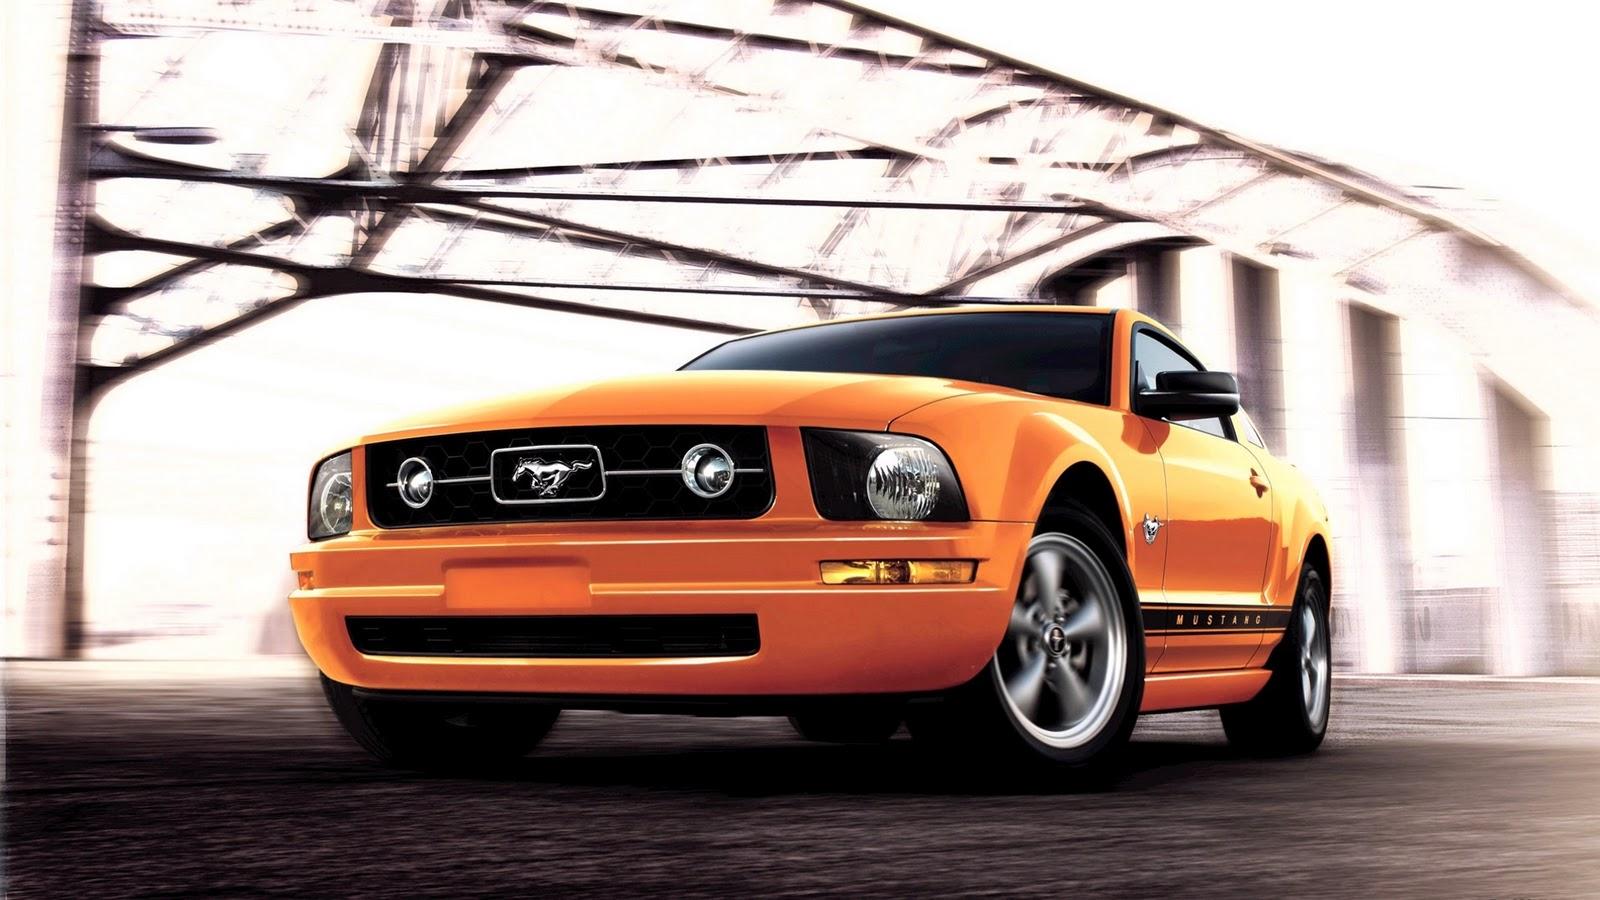 Best Desktop Hd Wallpaper Ford Mustang Desktop Wallpapers